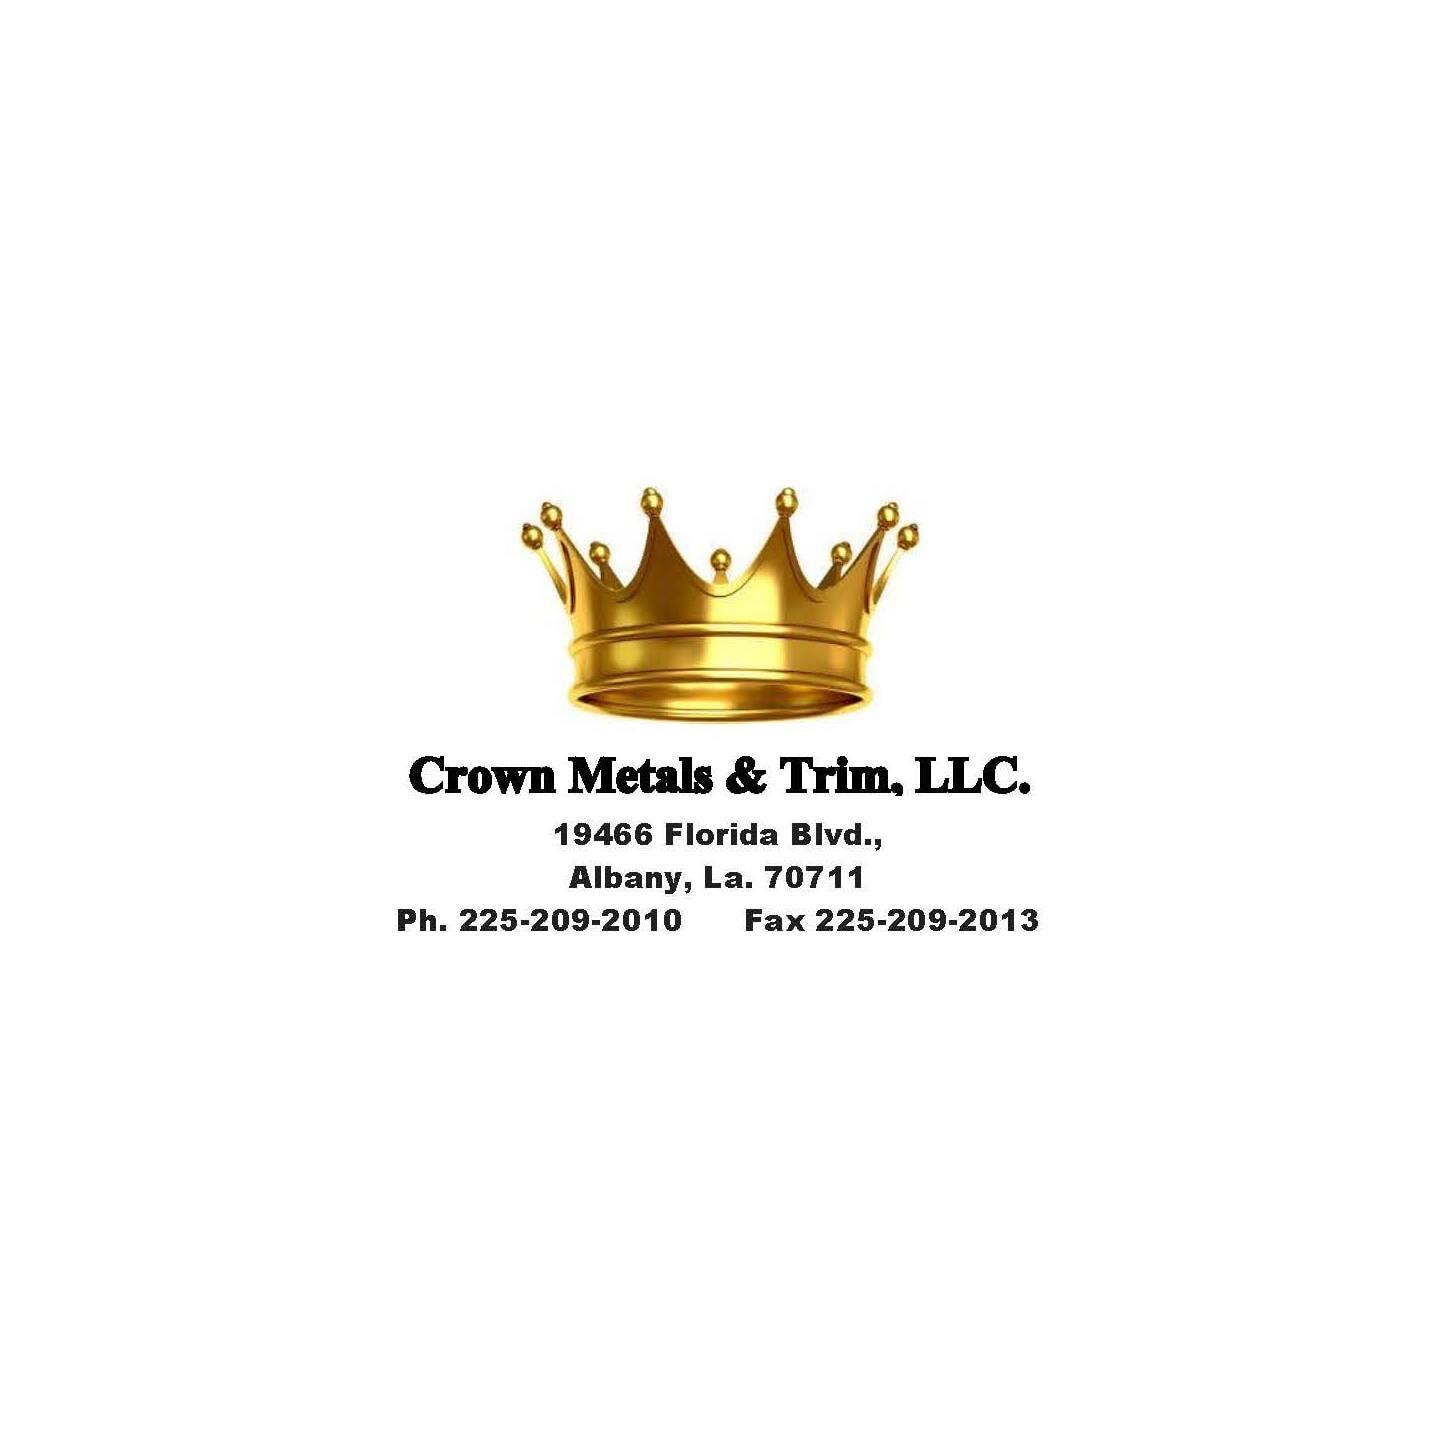 Crown Metals and Trim - Albany, LA - Metal Welding